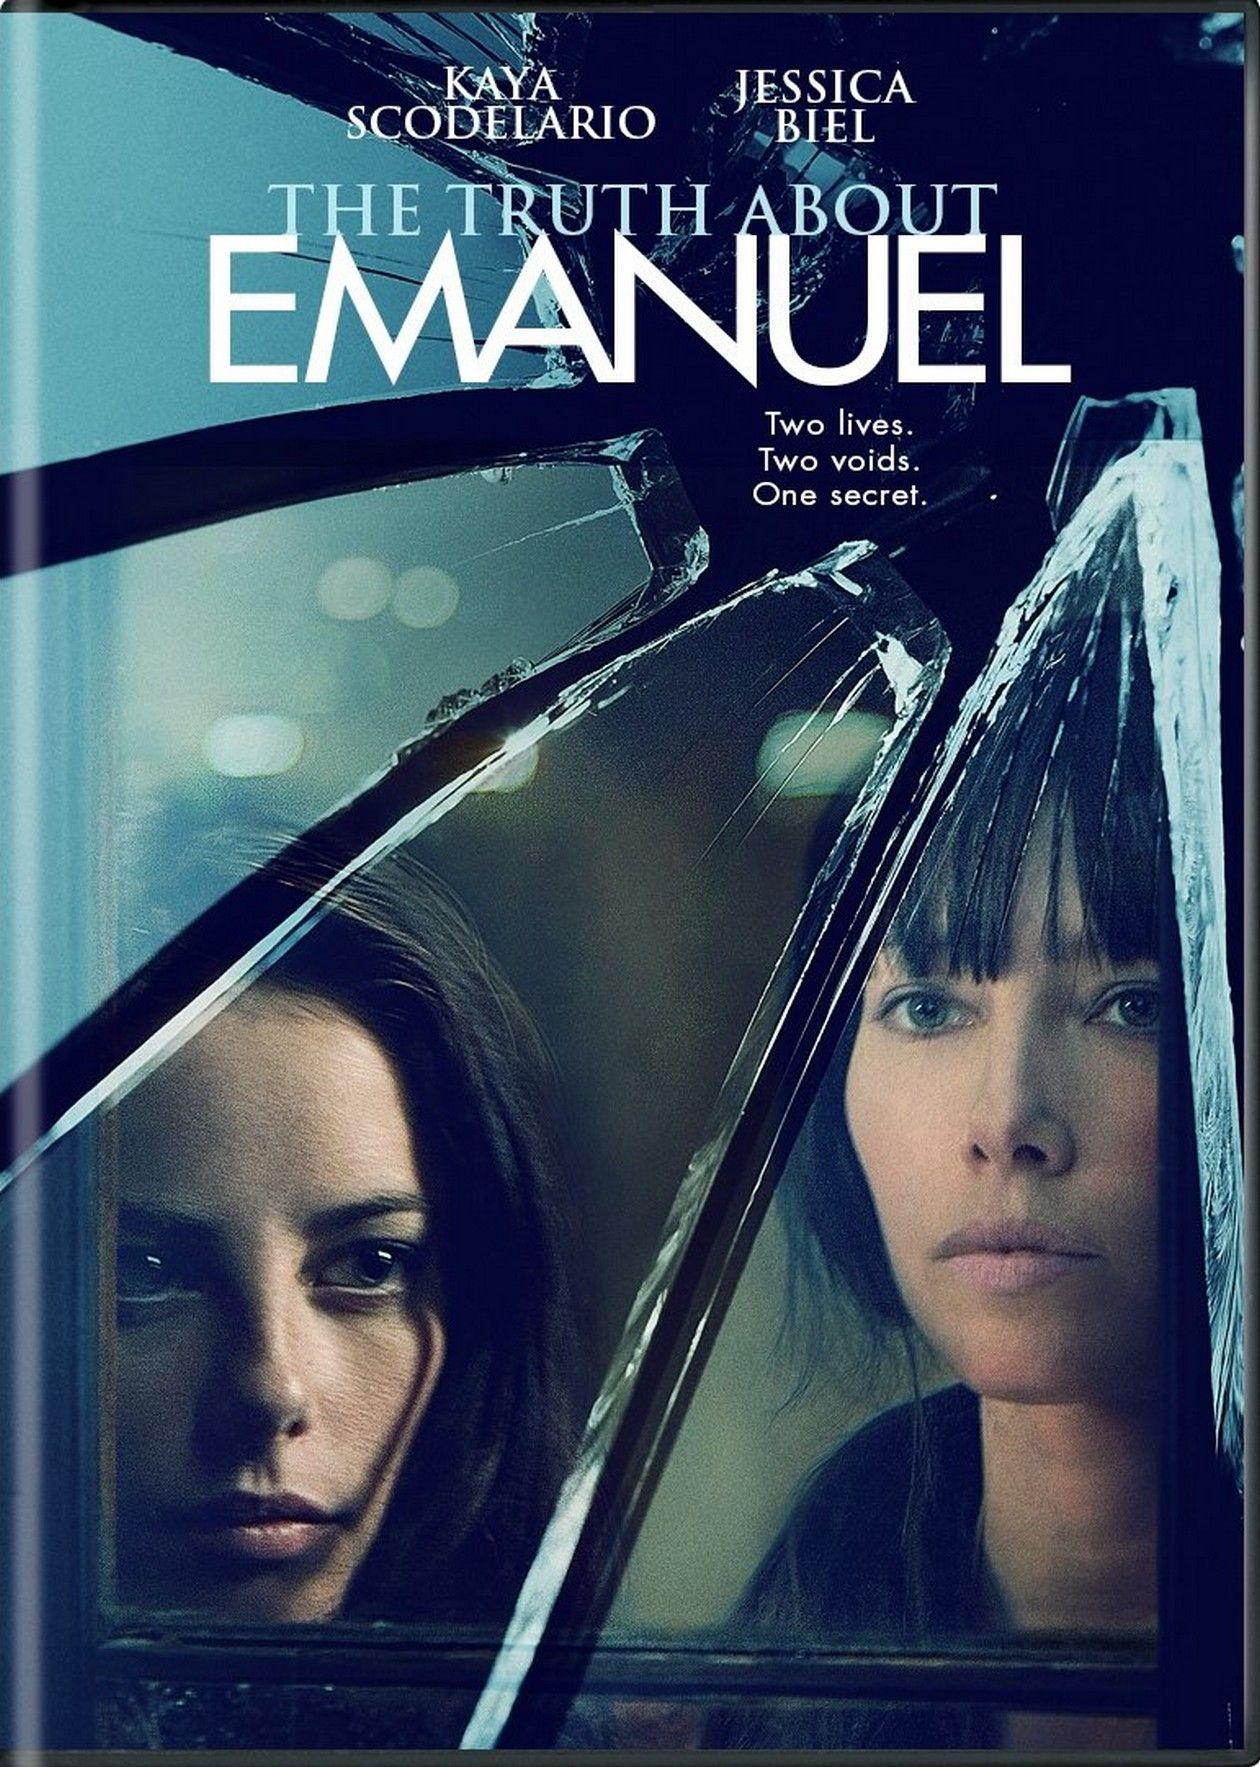 Kaya Scodelario / Jessica Biel actresses | The Truth About Emanuel / Francesca Gregorini 2013 Movie Poster Affiche film